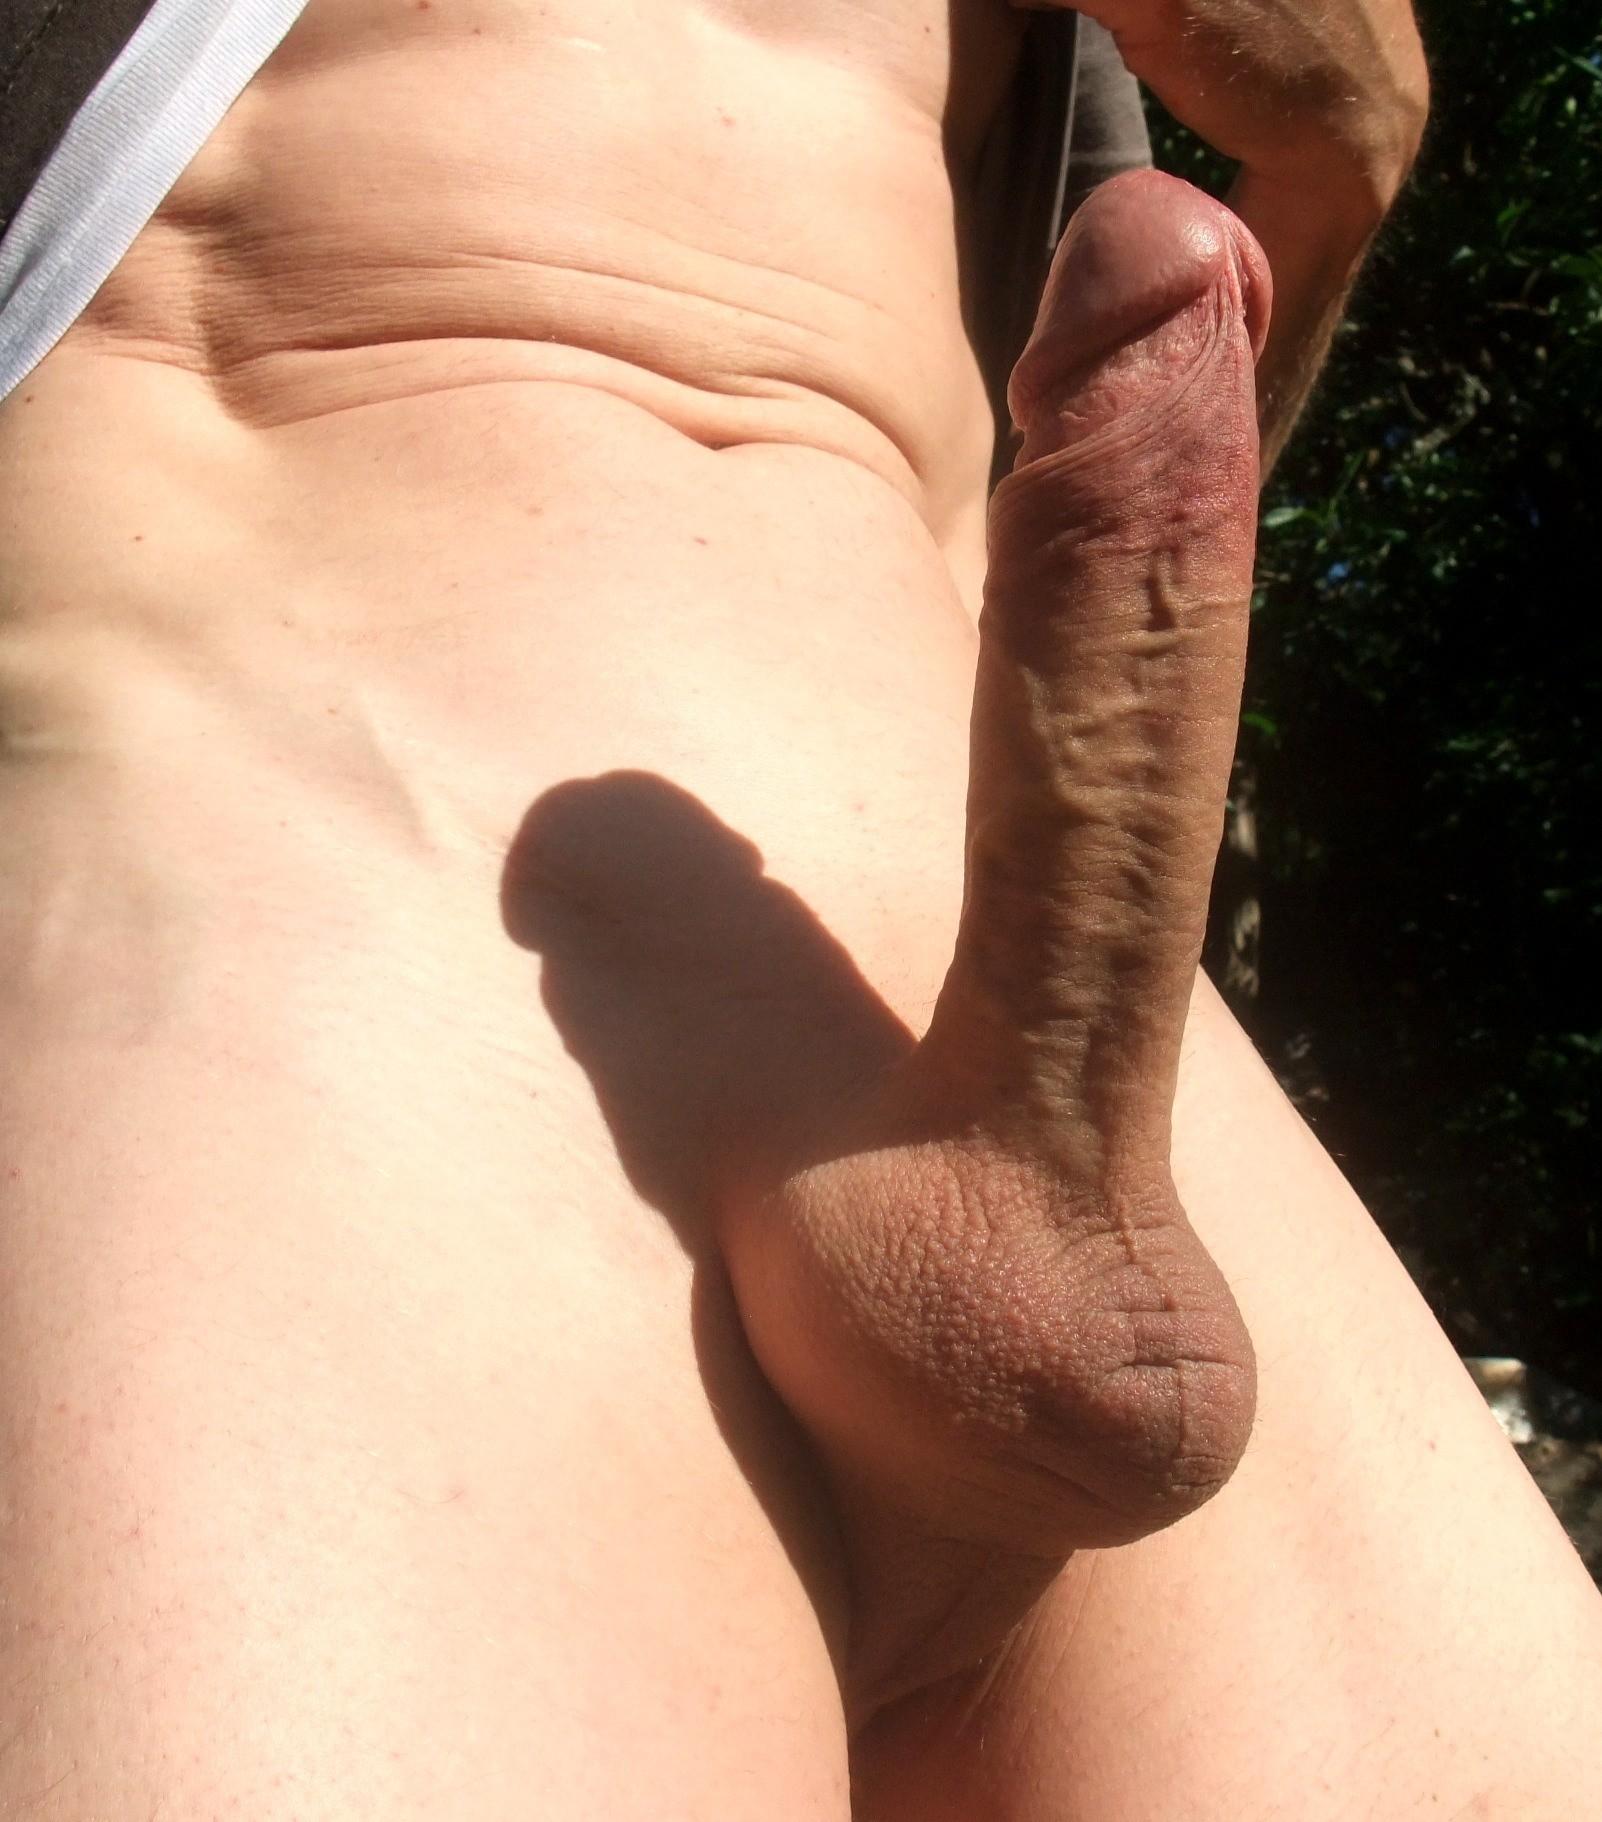 amature wife forced crying gangbang videos free porn videos #cock #penis #hardon #hardcock #straightcock #bareballs #shavedballs #shavedcock #stiffcock #circumcised #closeup #cockpic #amateur